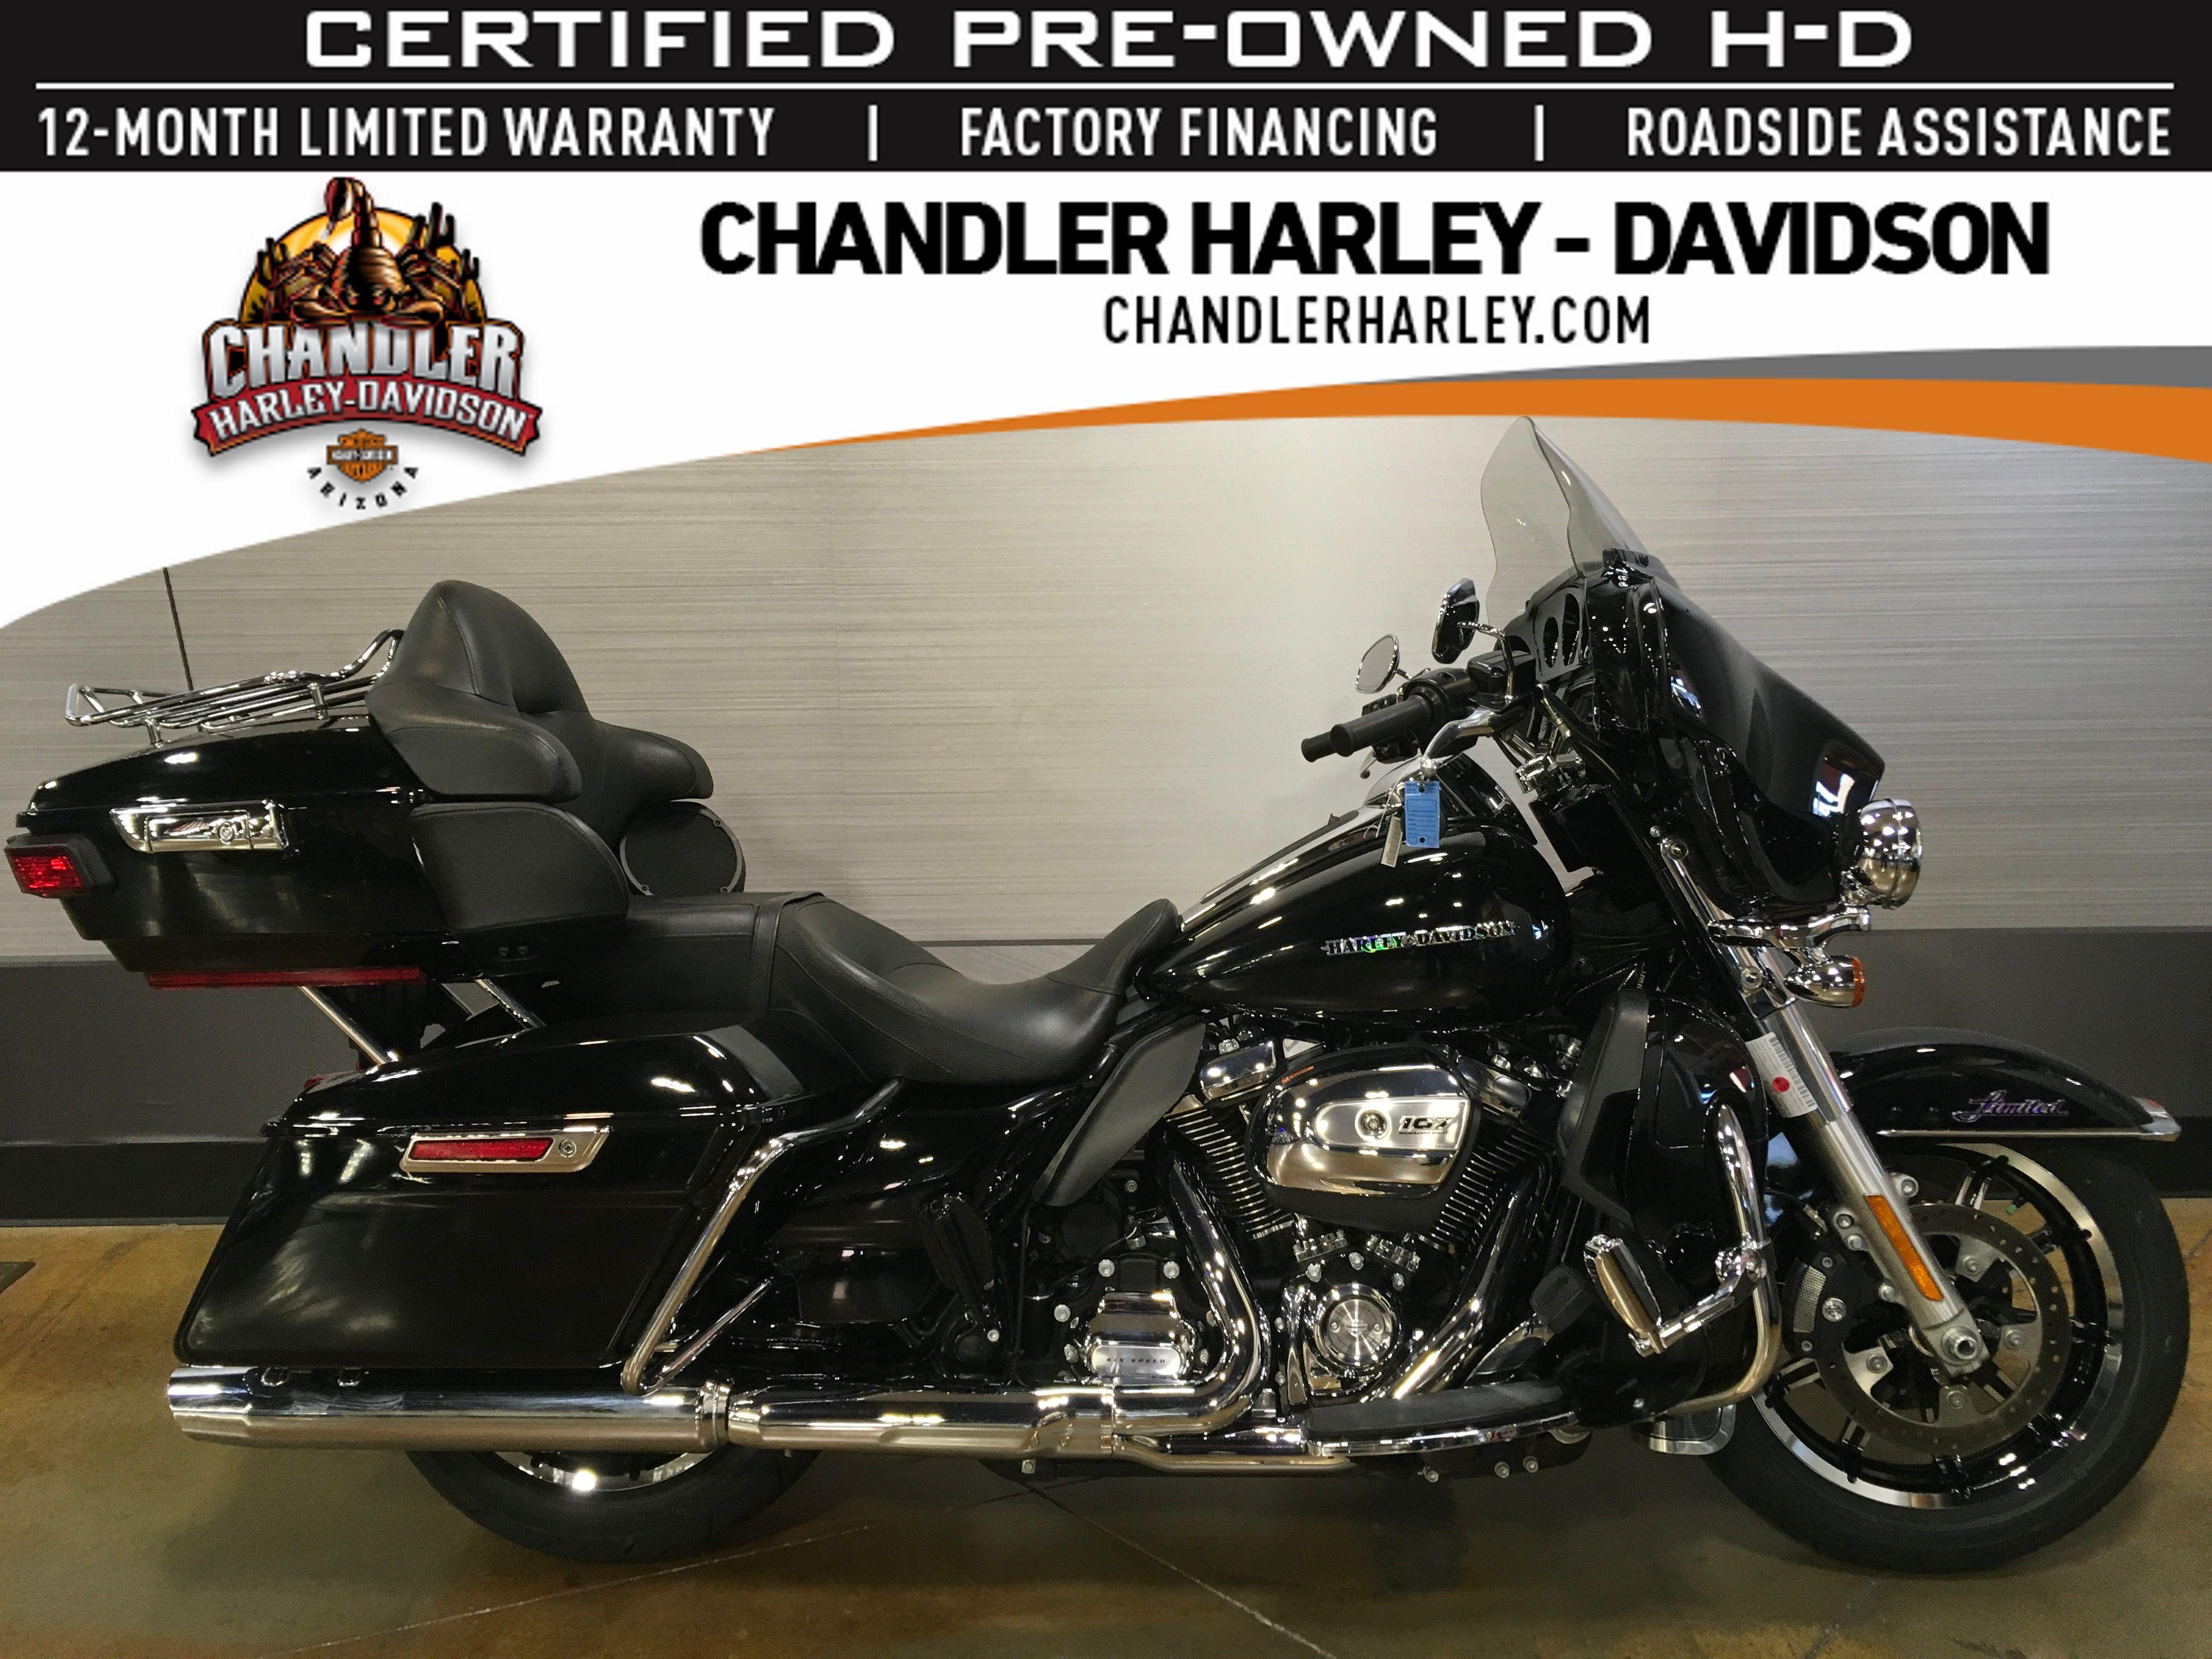 2018 Harley-Davidson Ultra Limited Low